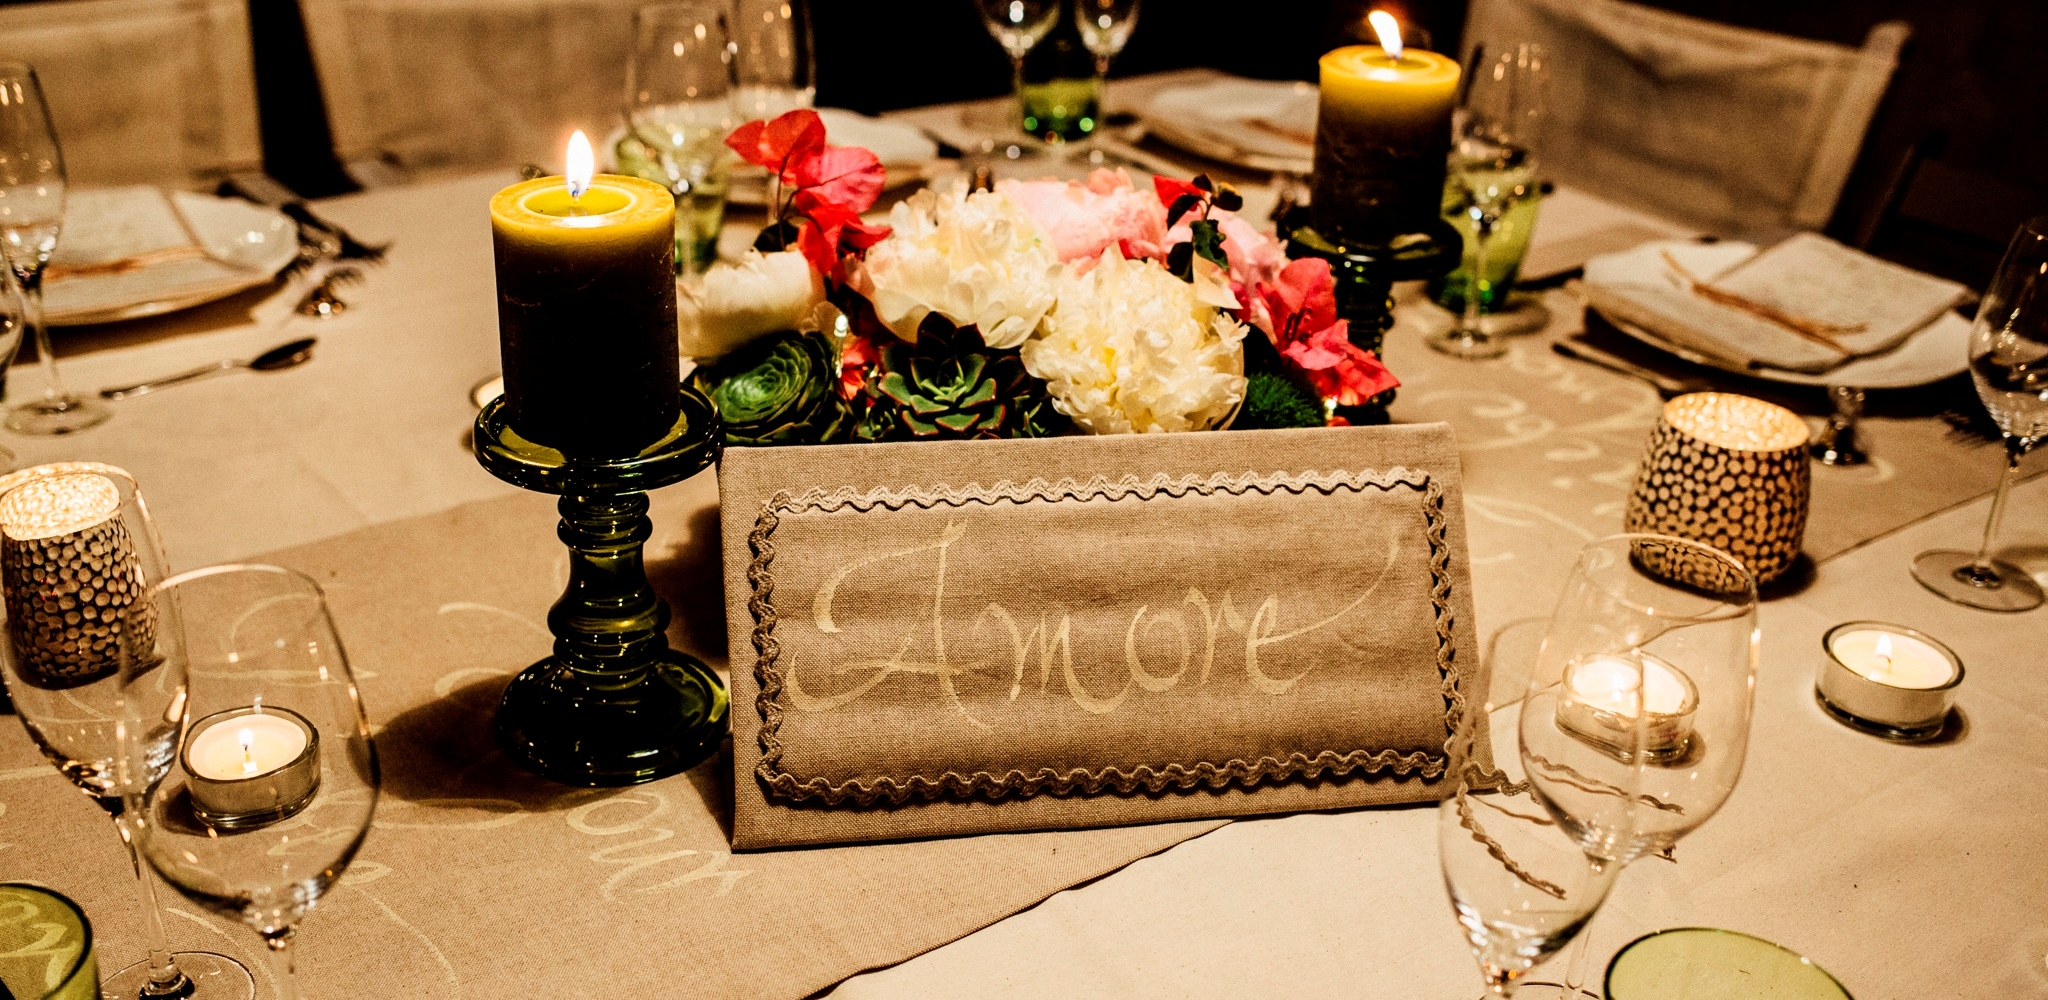 pantelleria_wedding_Andrea_Trimarchi_fotografo-26